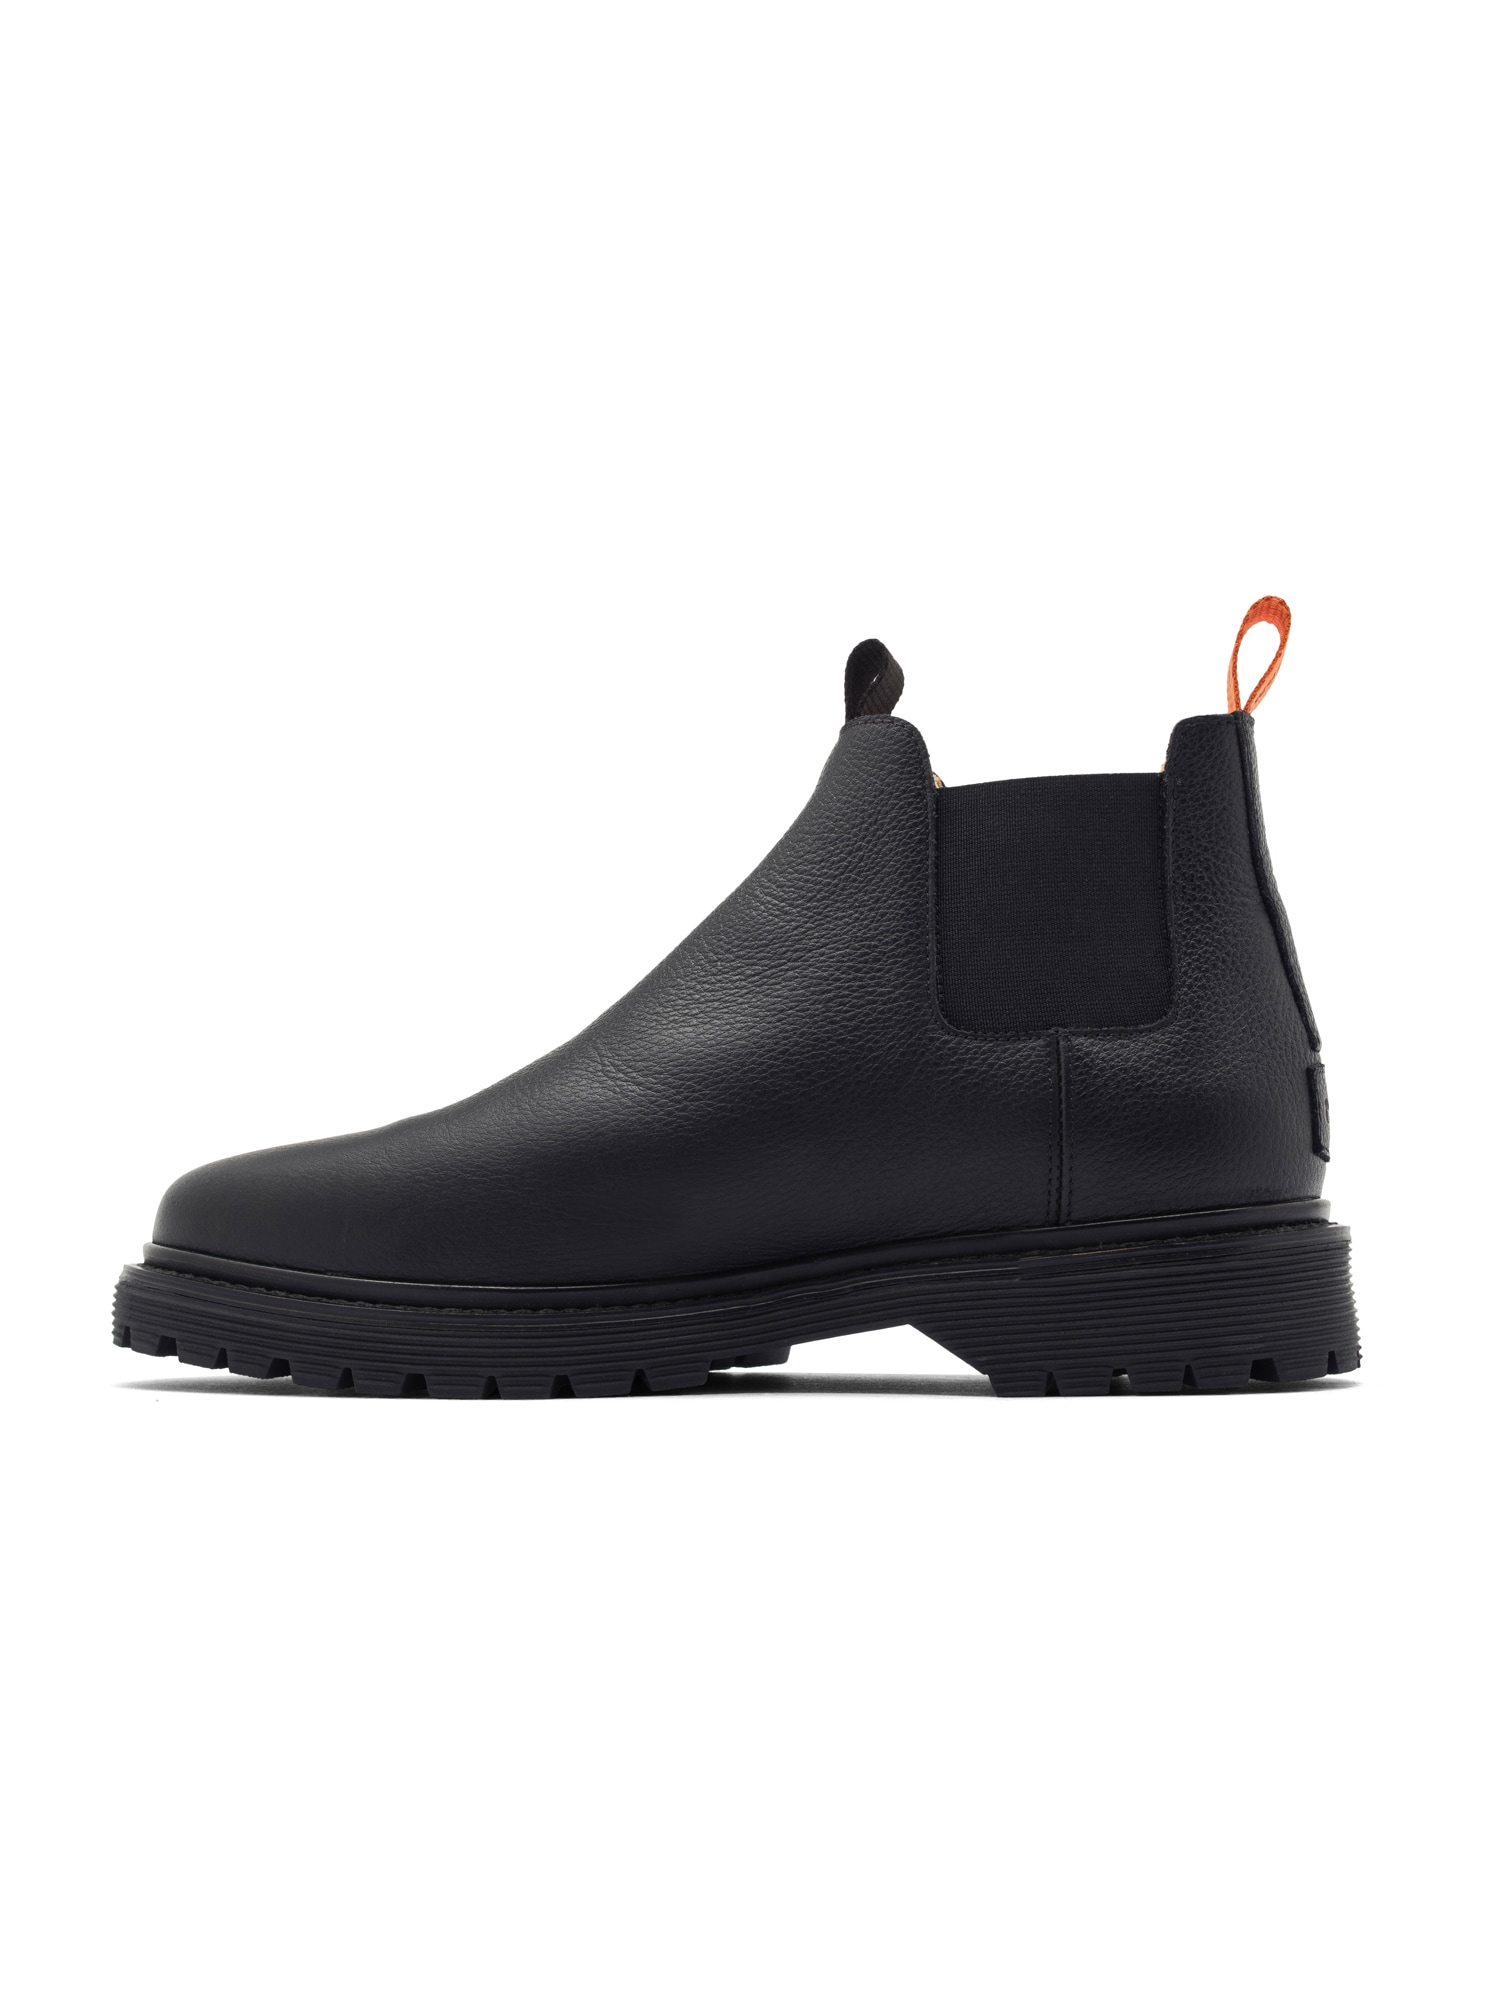 EKN Footwear Aulinukai juoda